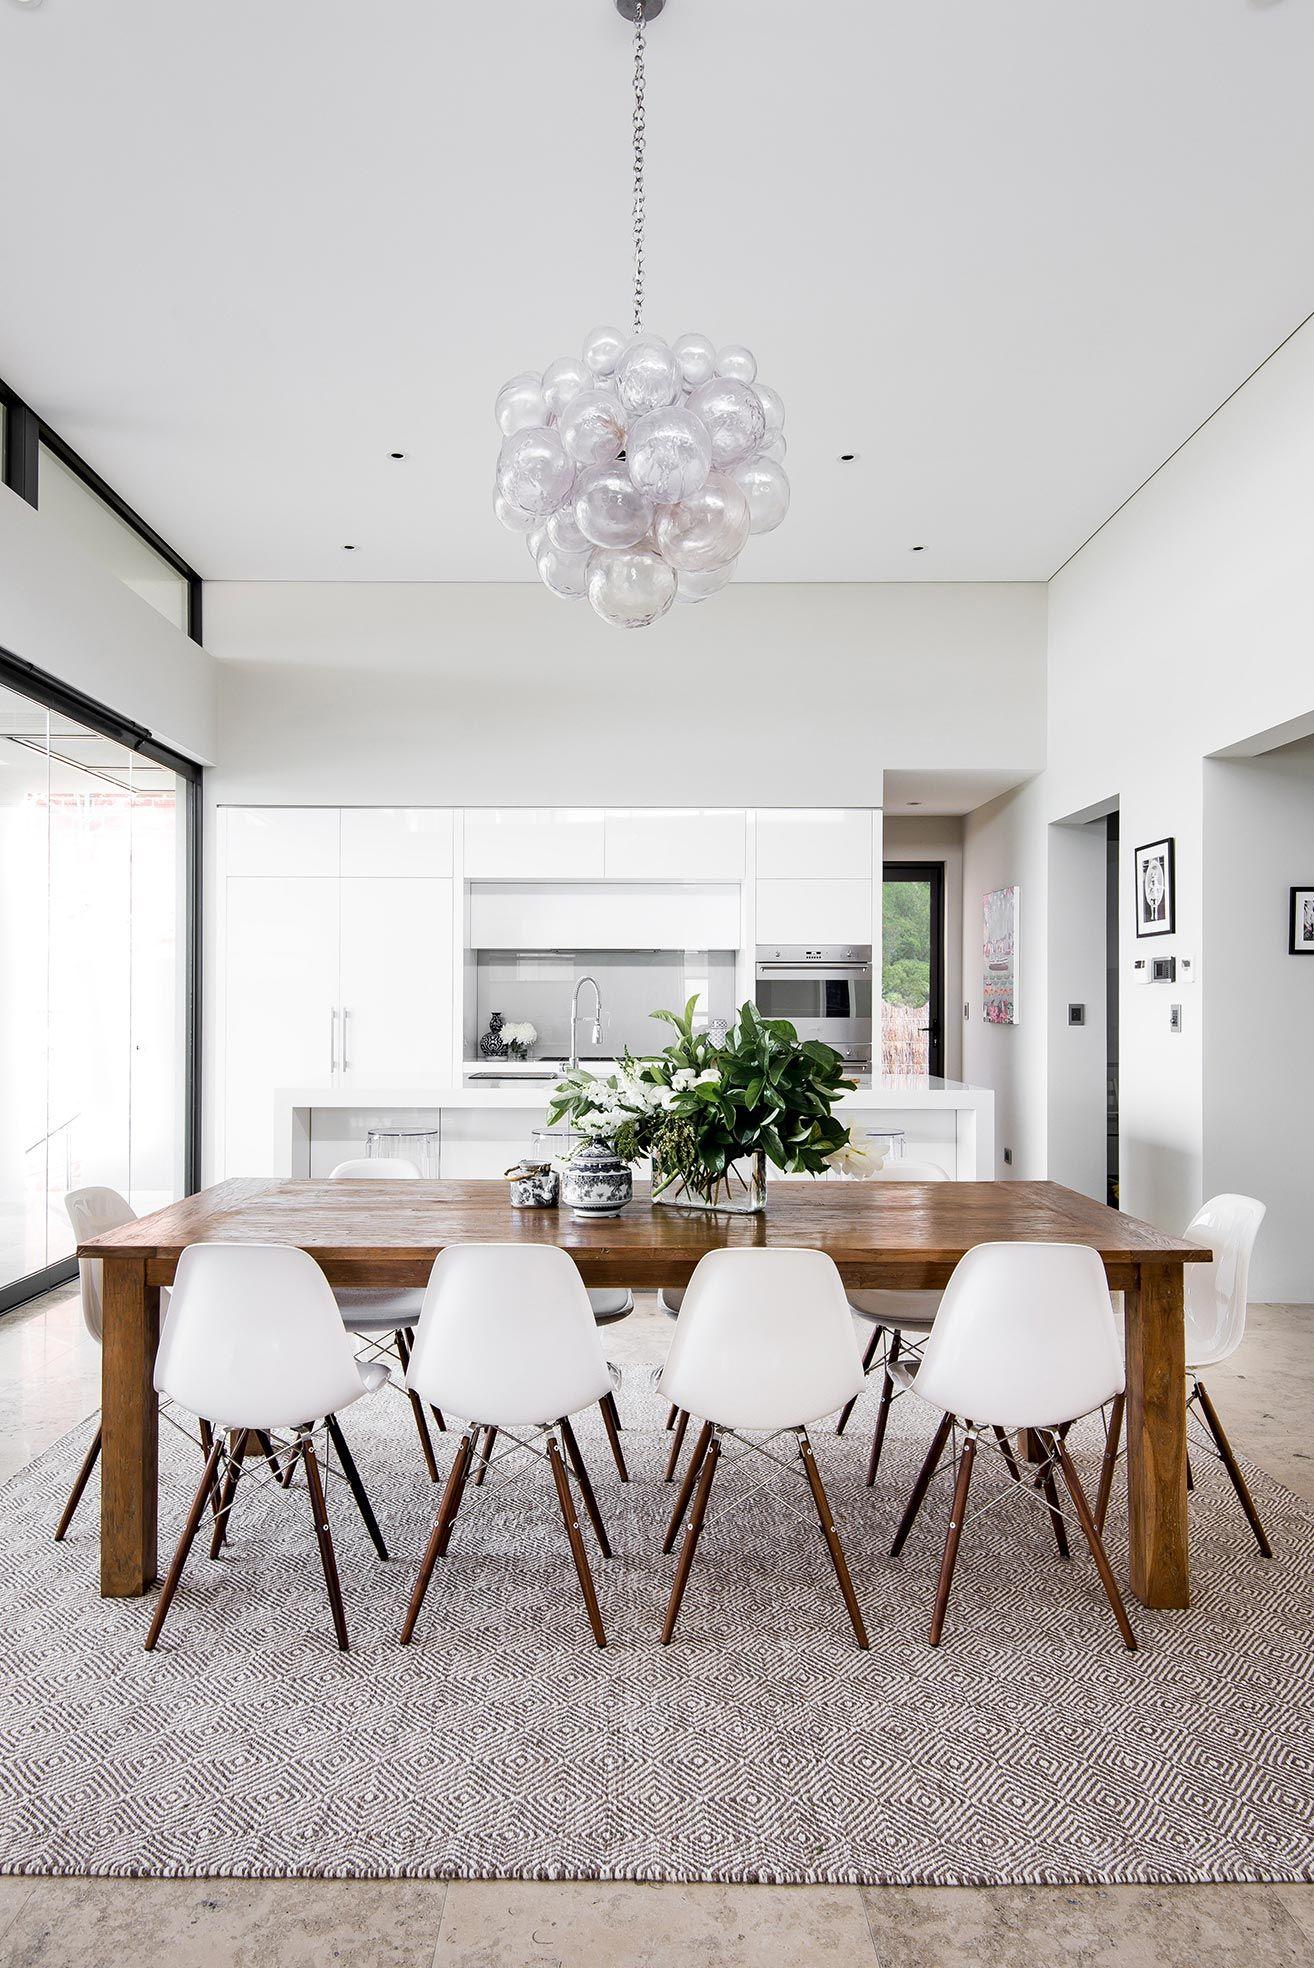 Midcentury modern kitchendining room interior design coco